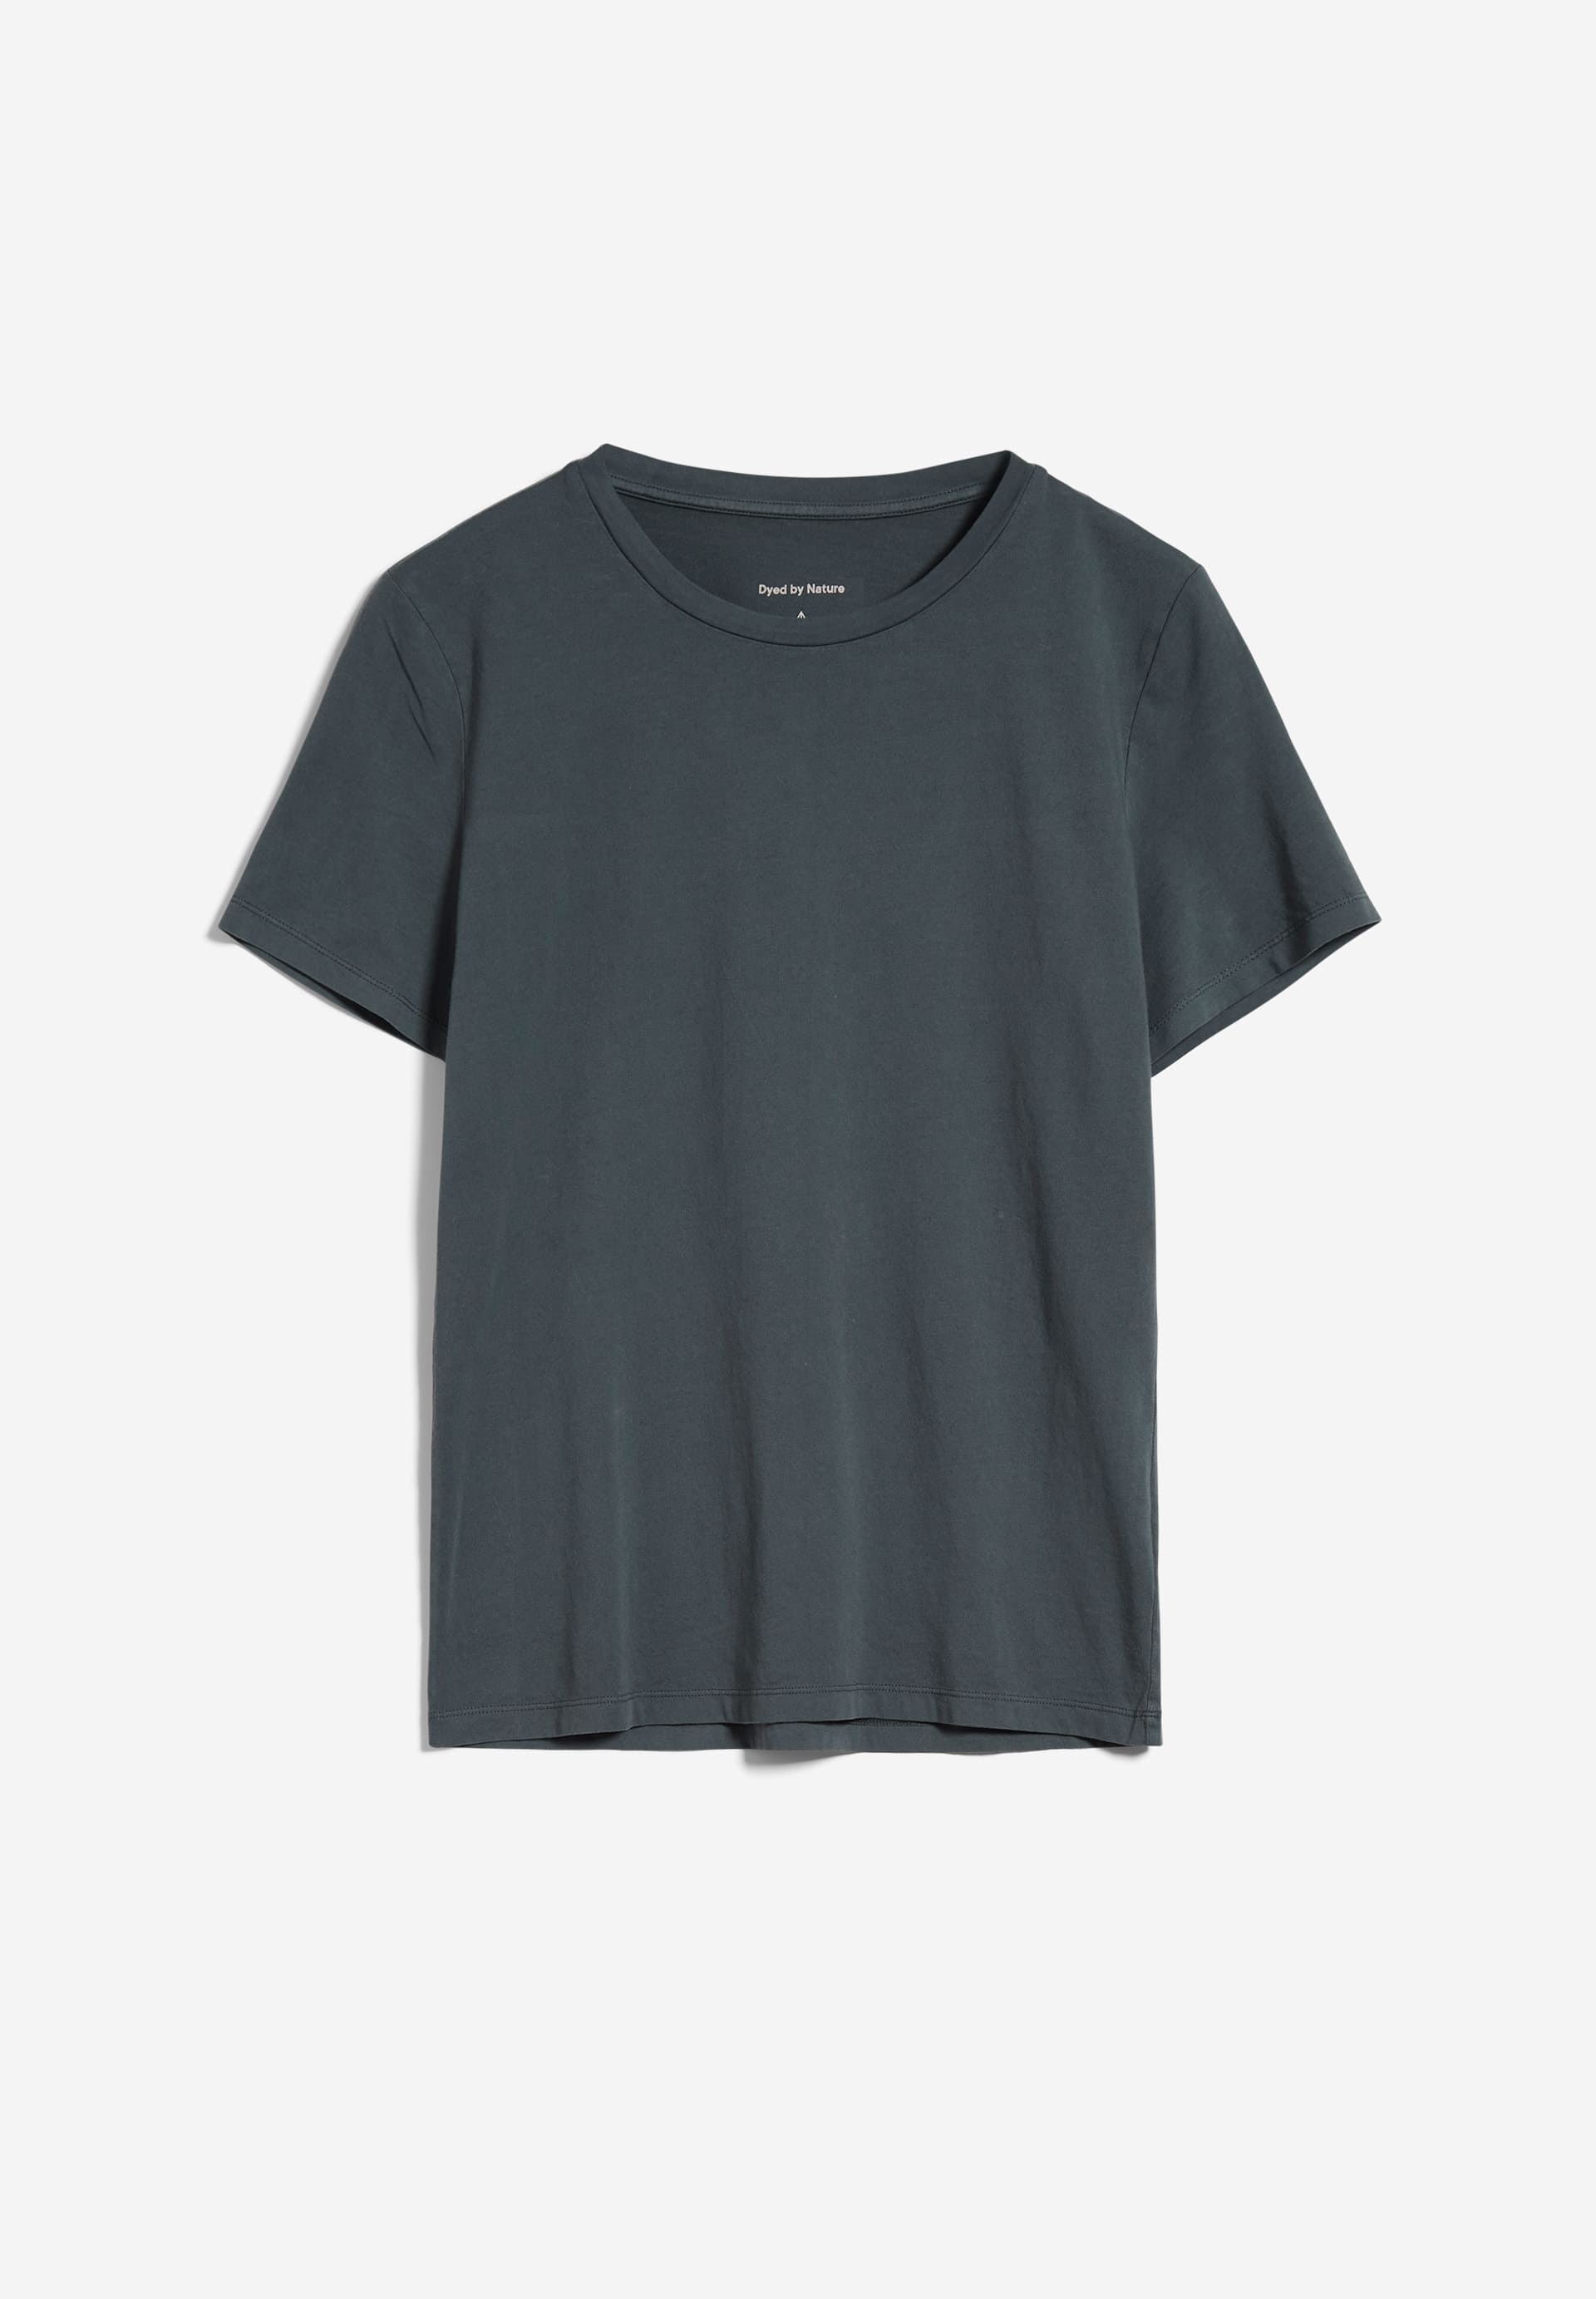 MARAA EARTHCOLORS® T-shirt van biologisch katoen